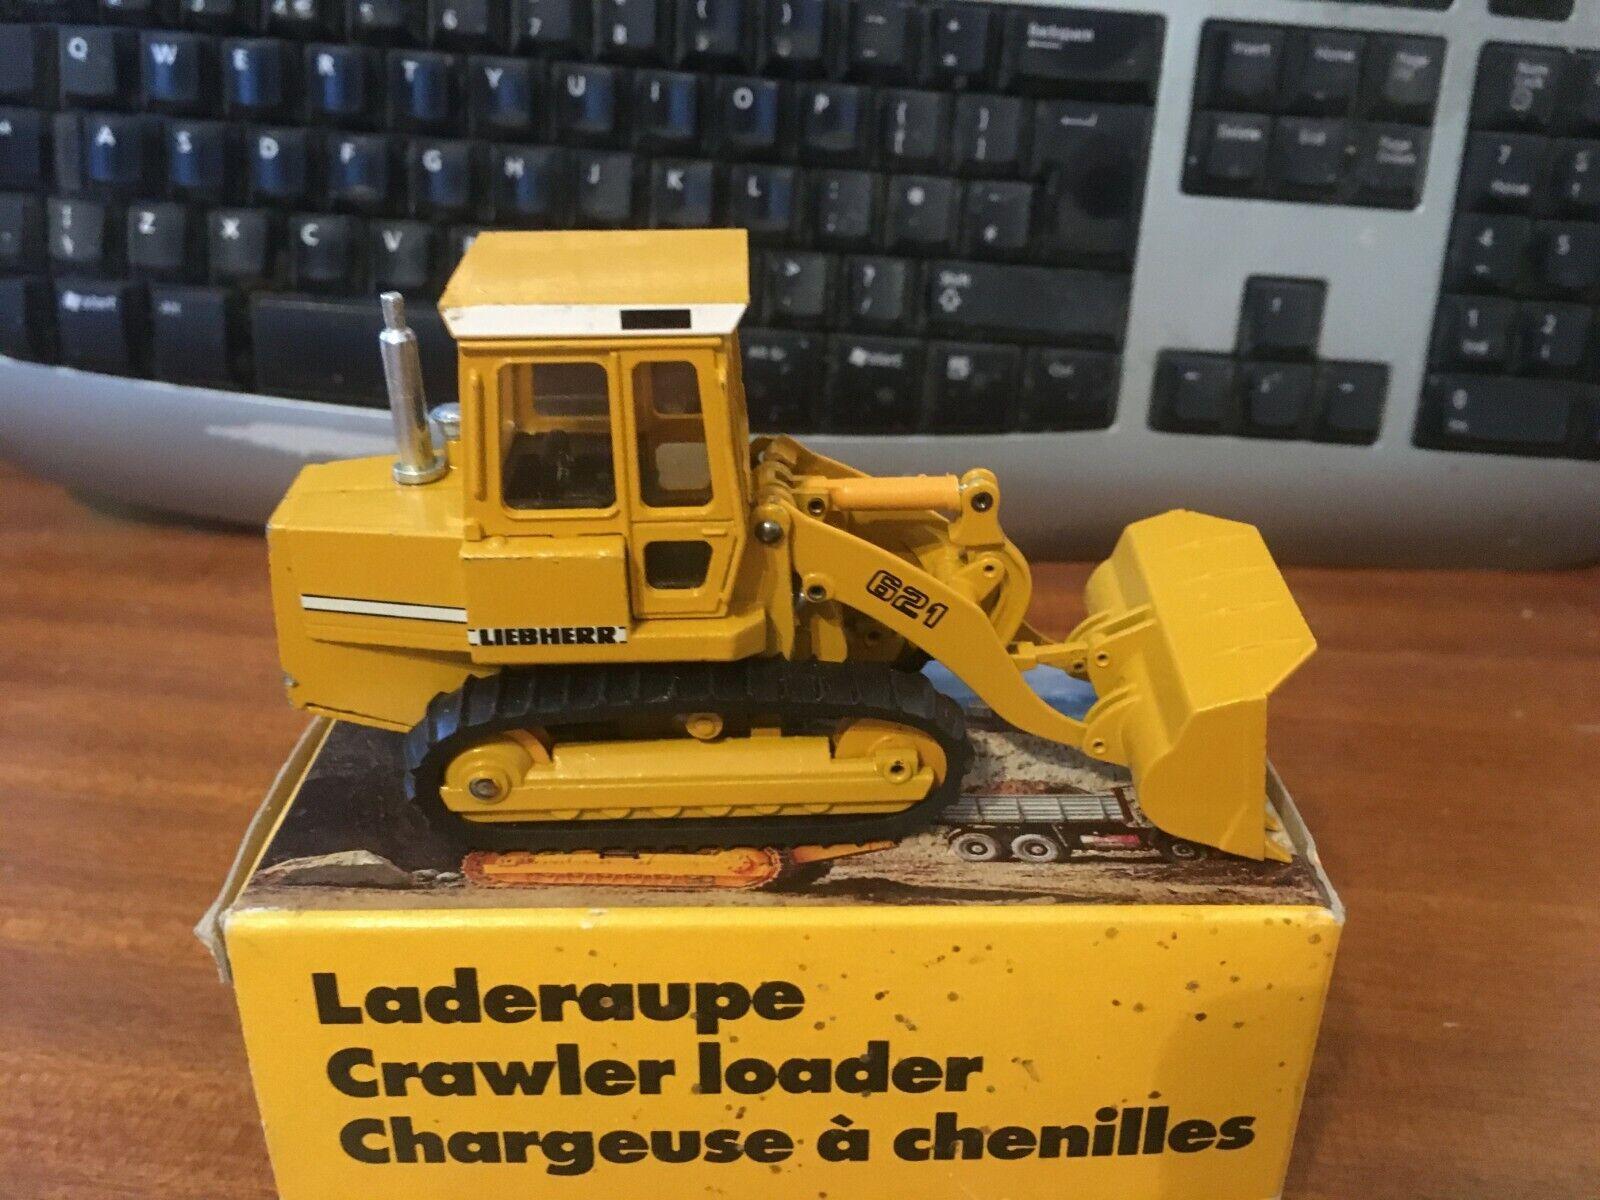 Conrad 1 50 Scale Liebherr LR621 LR621 Crawler Loader - Boxed